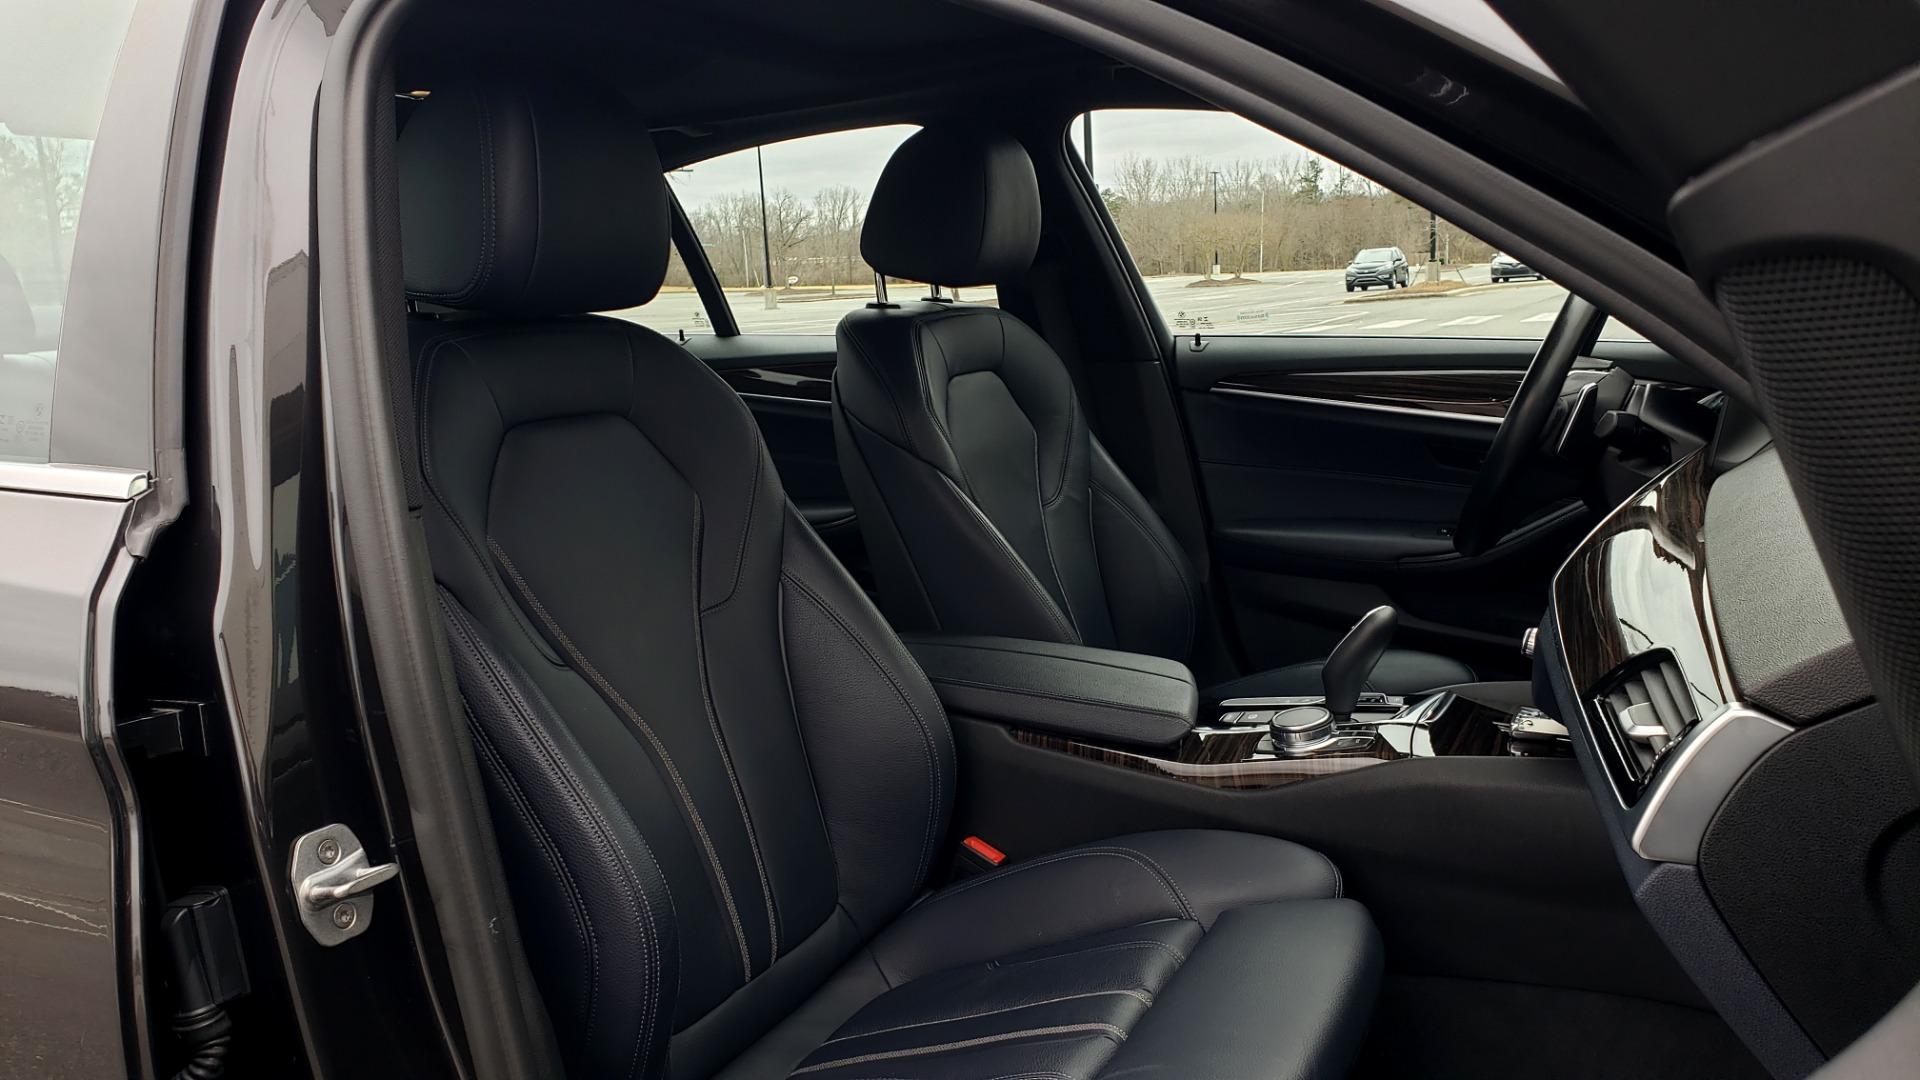 Used 2017 BMW 5 SERIES 530IXDRIVE / PREM PKG / DRVR ASST PLUS / CLD WTHR / APPLE CARPLAY for sale Sold at Formula Imports in Charlotte NC 28227 68